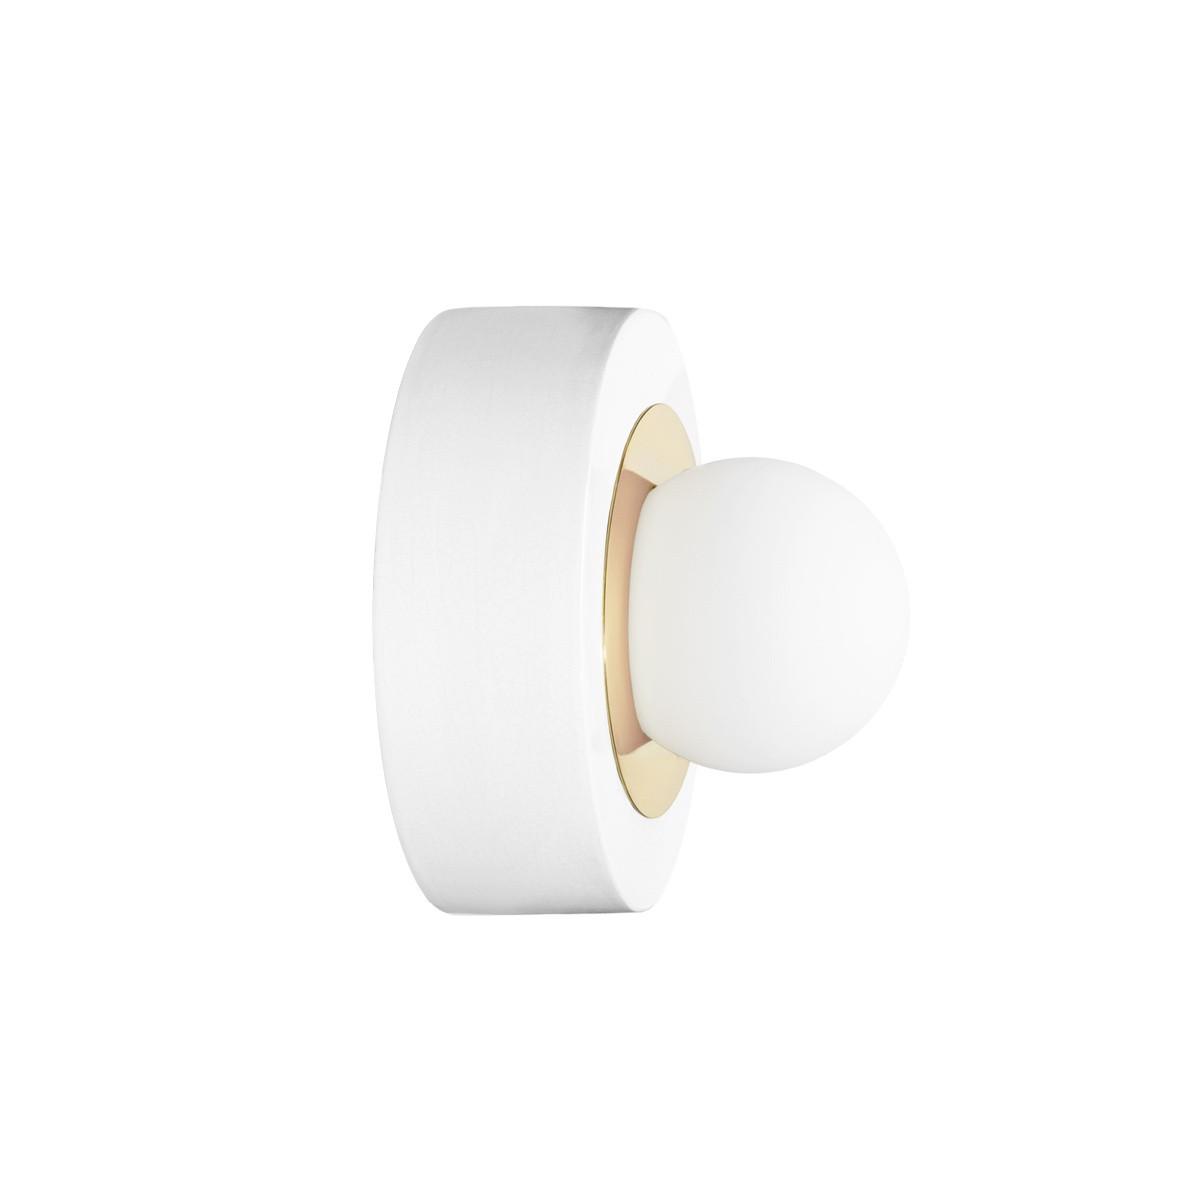 TSF + HAOS Wall Lamp 3.02, White